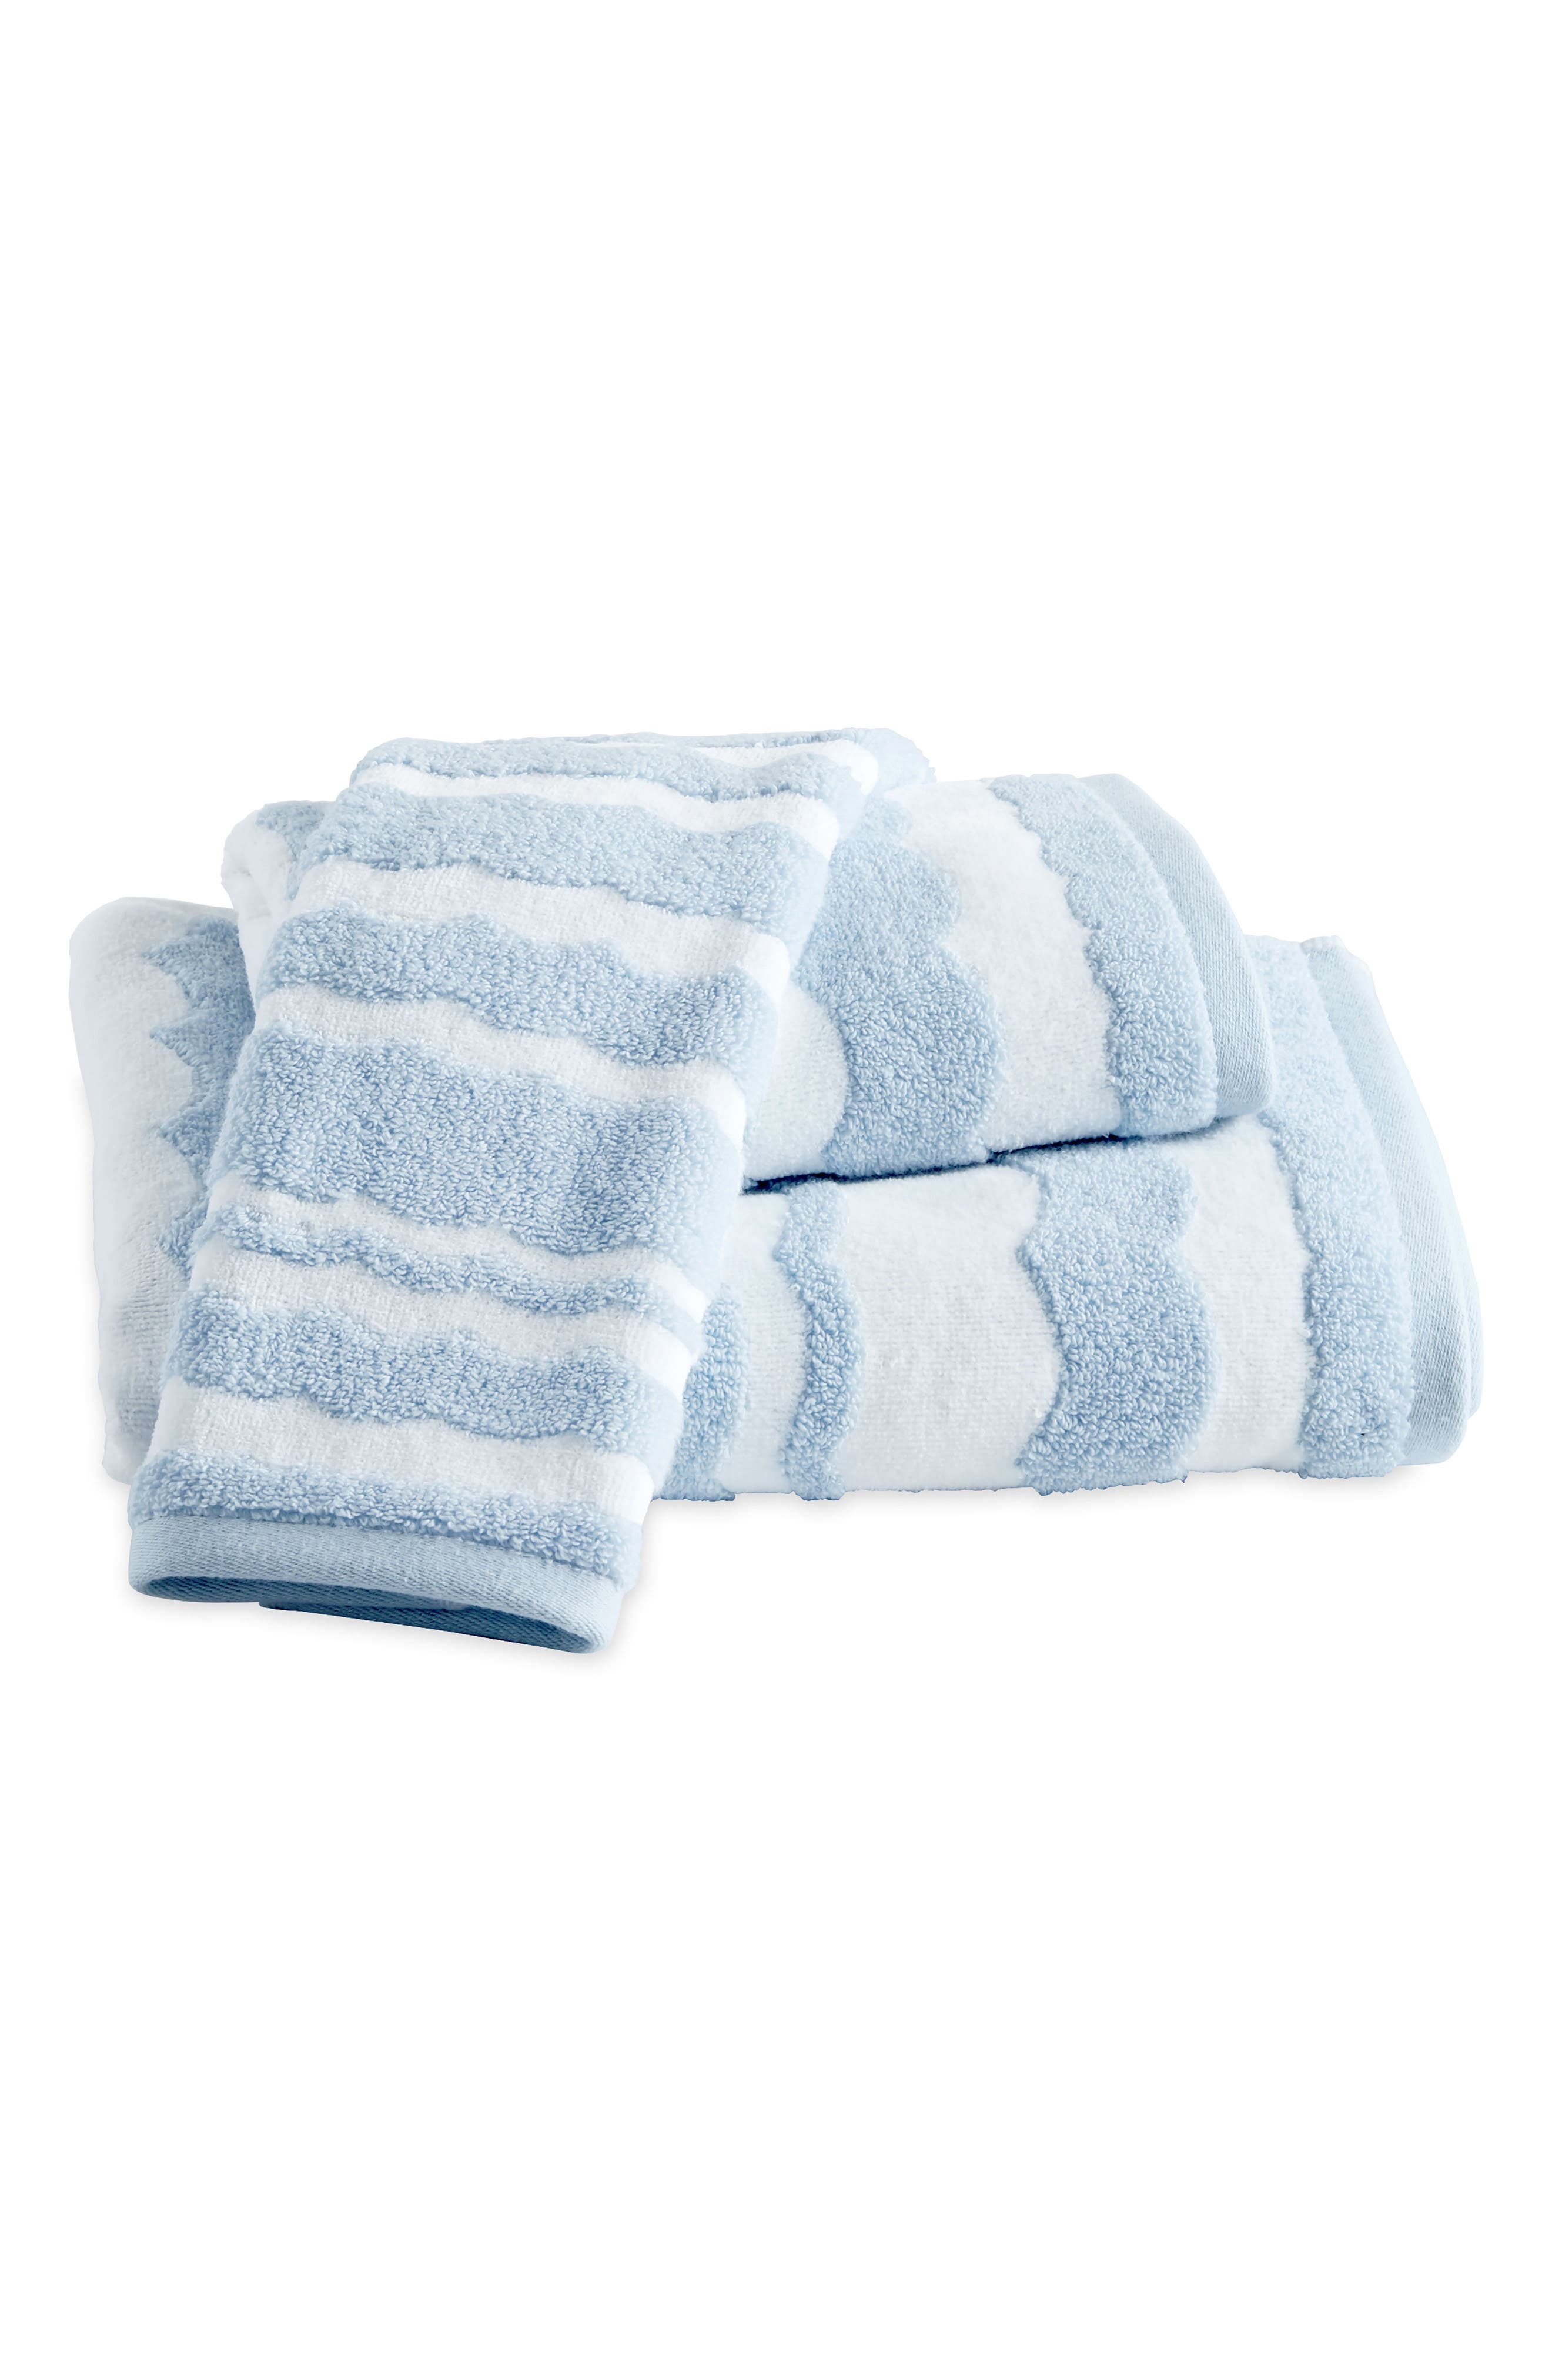 Wave Scallop Bath Towel, Hand Towel and Tip Towel Set,                         Main,                         color, Blue